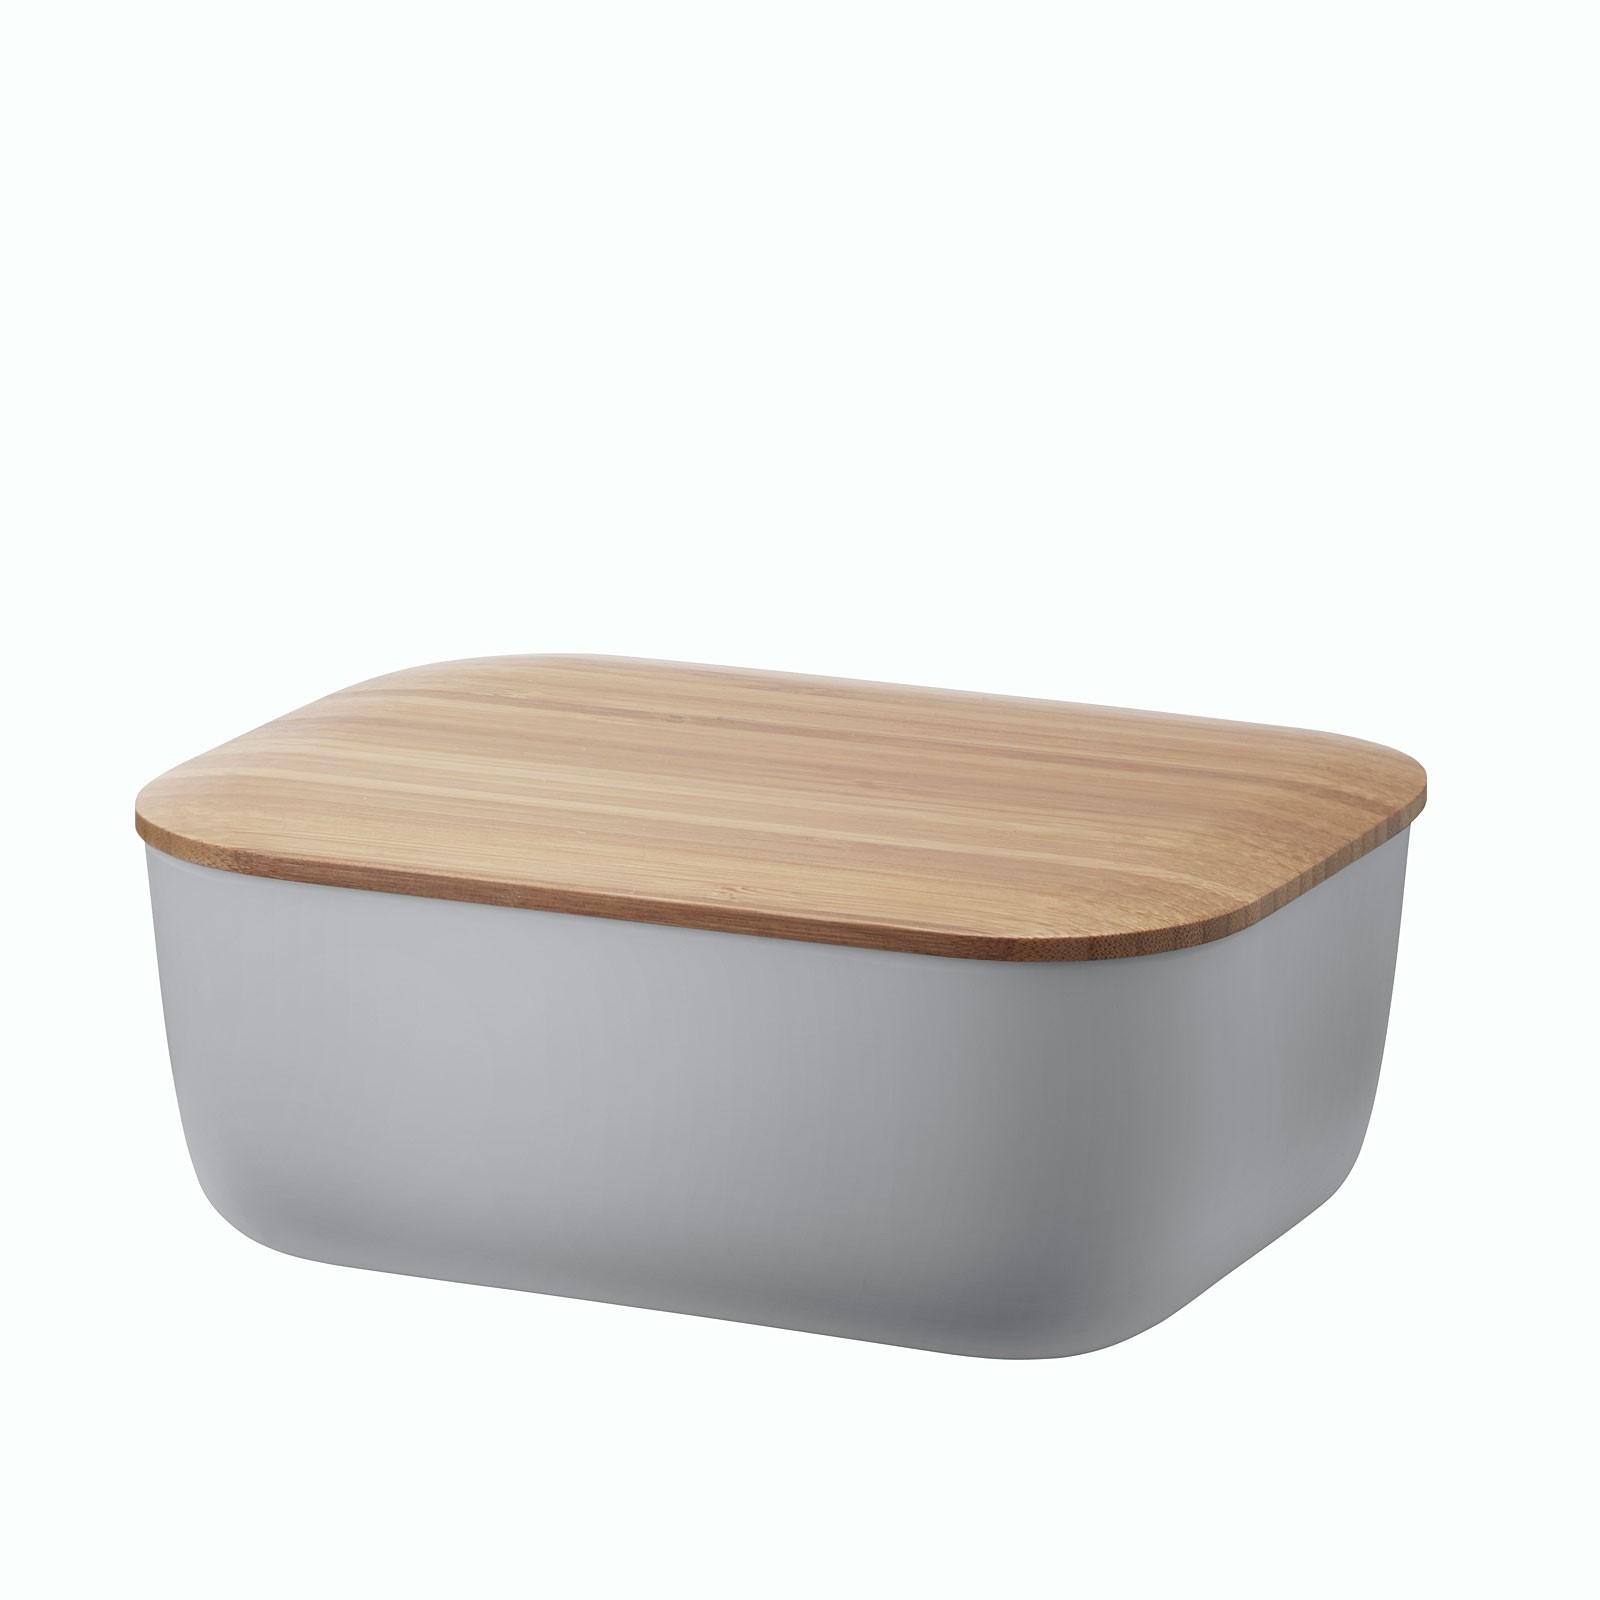 RIG-TIG by stelton Butterdose BOX-IT mit Bambusdeckel warm grey